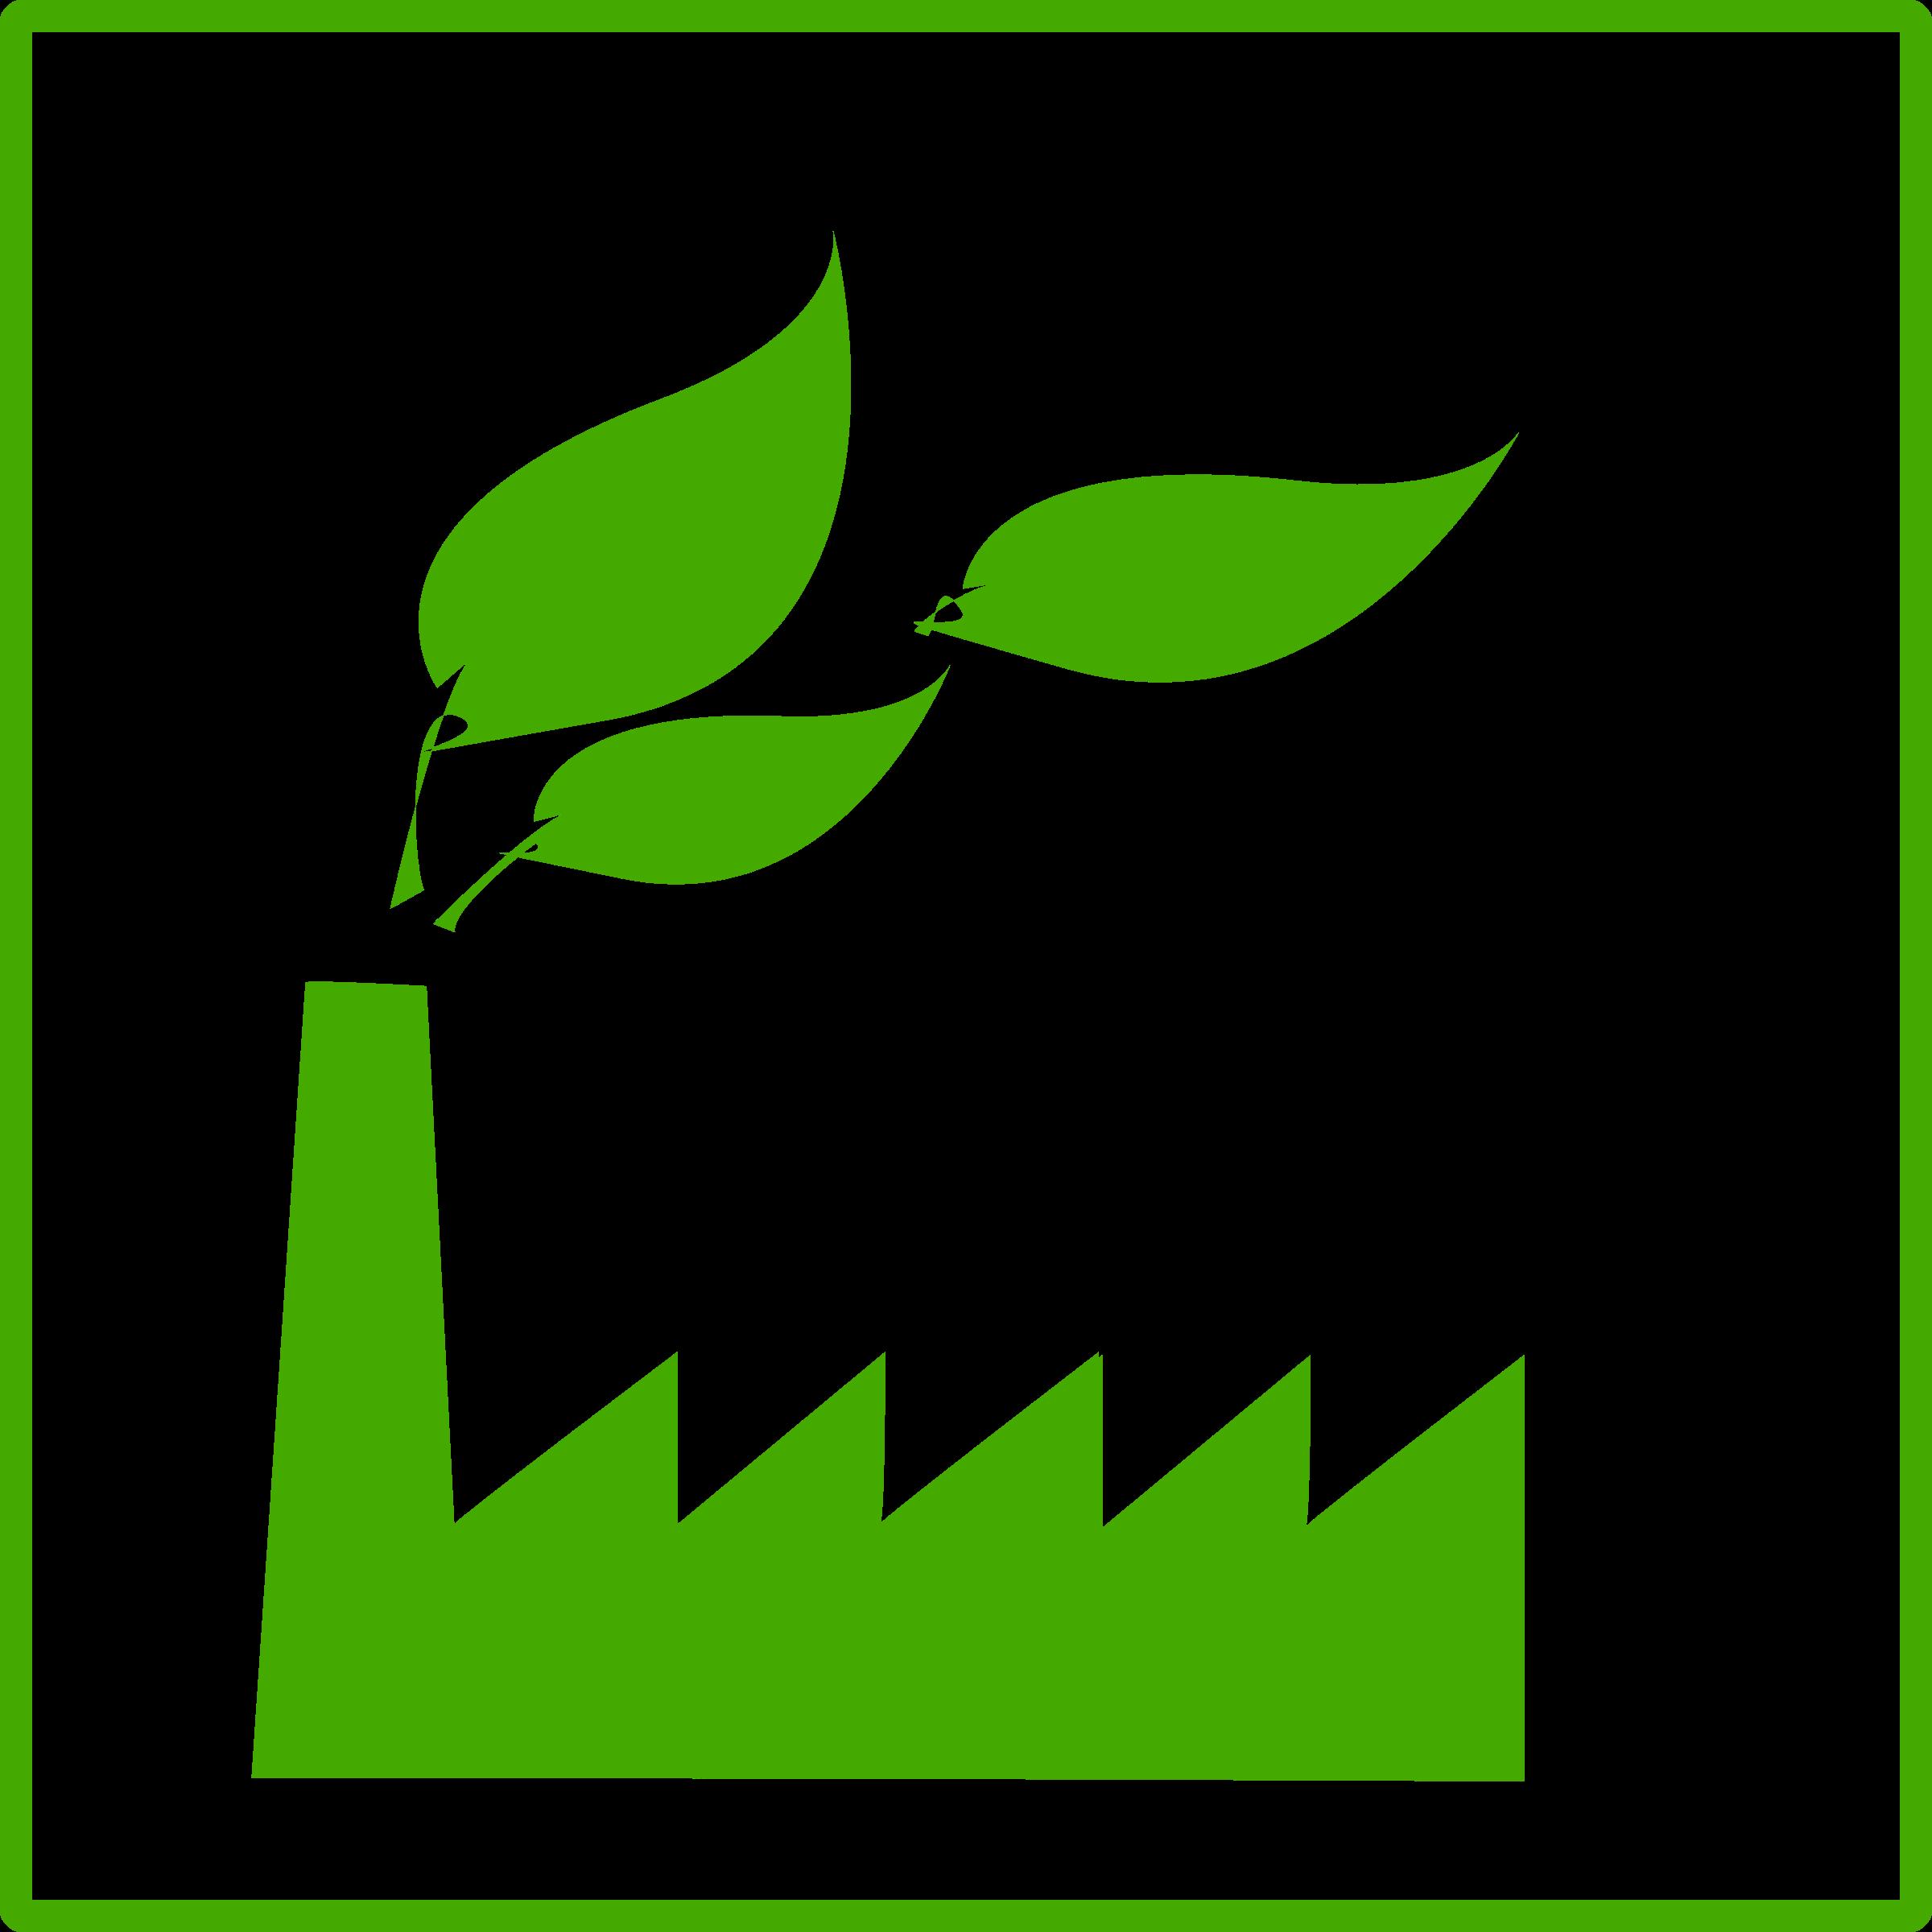 Eco Green Factory Icon image #1228